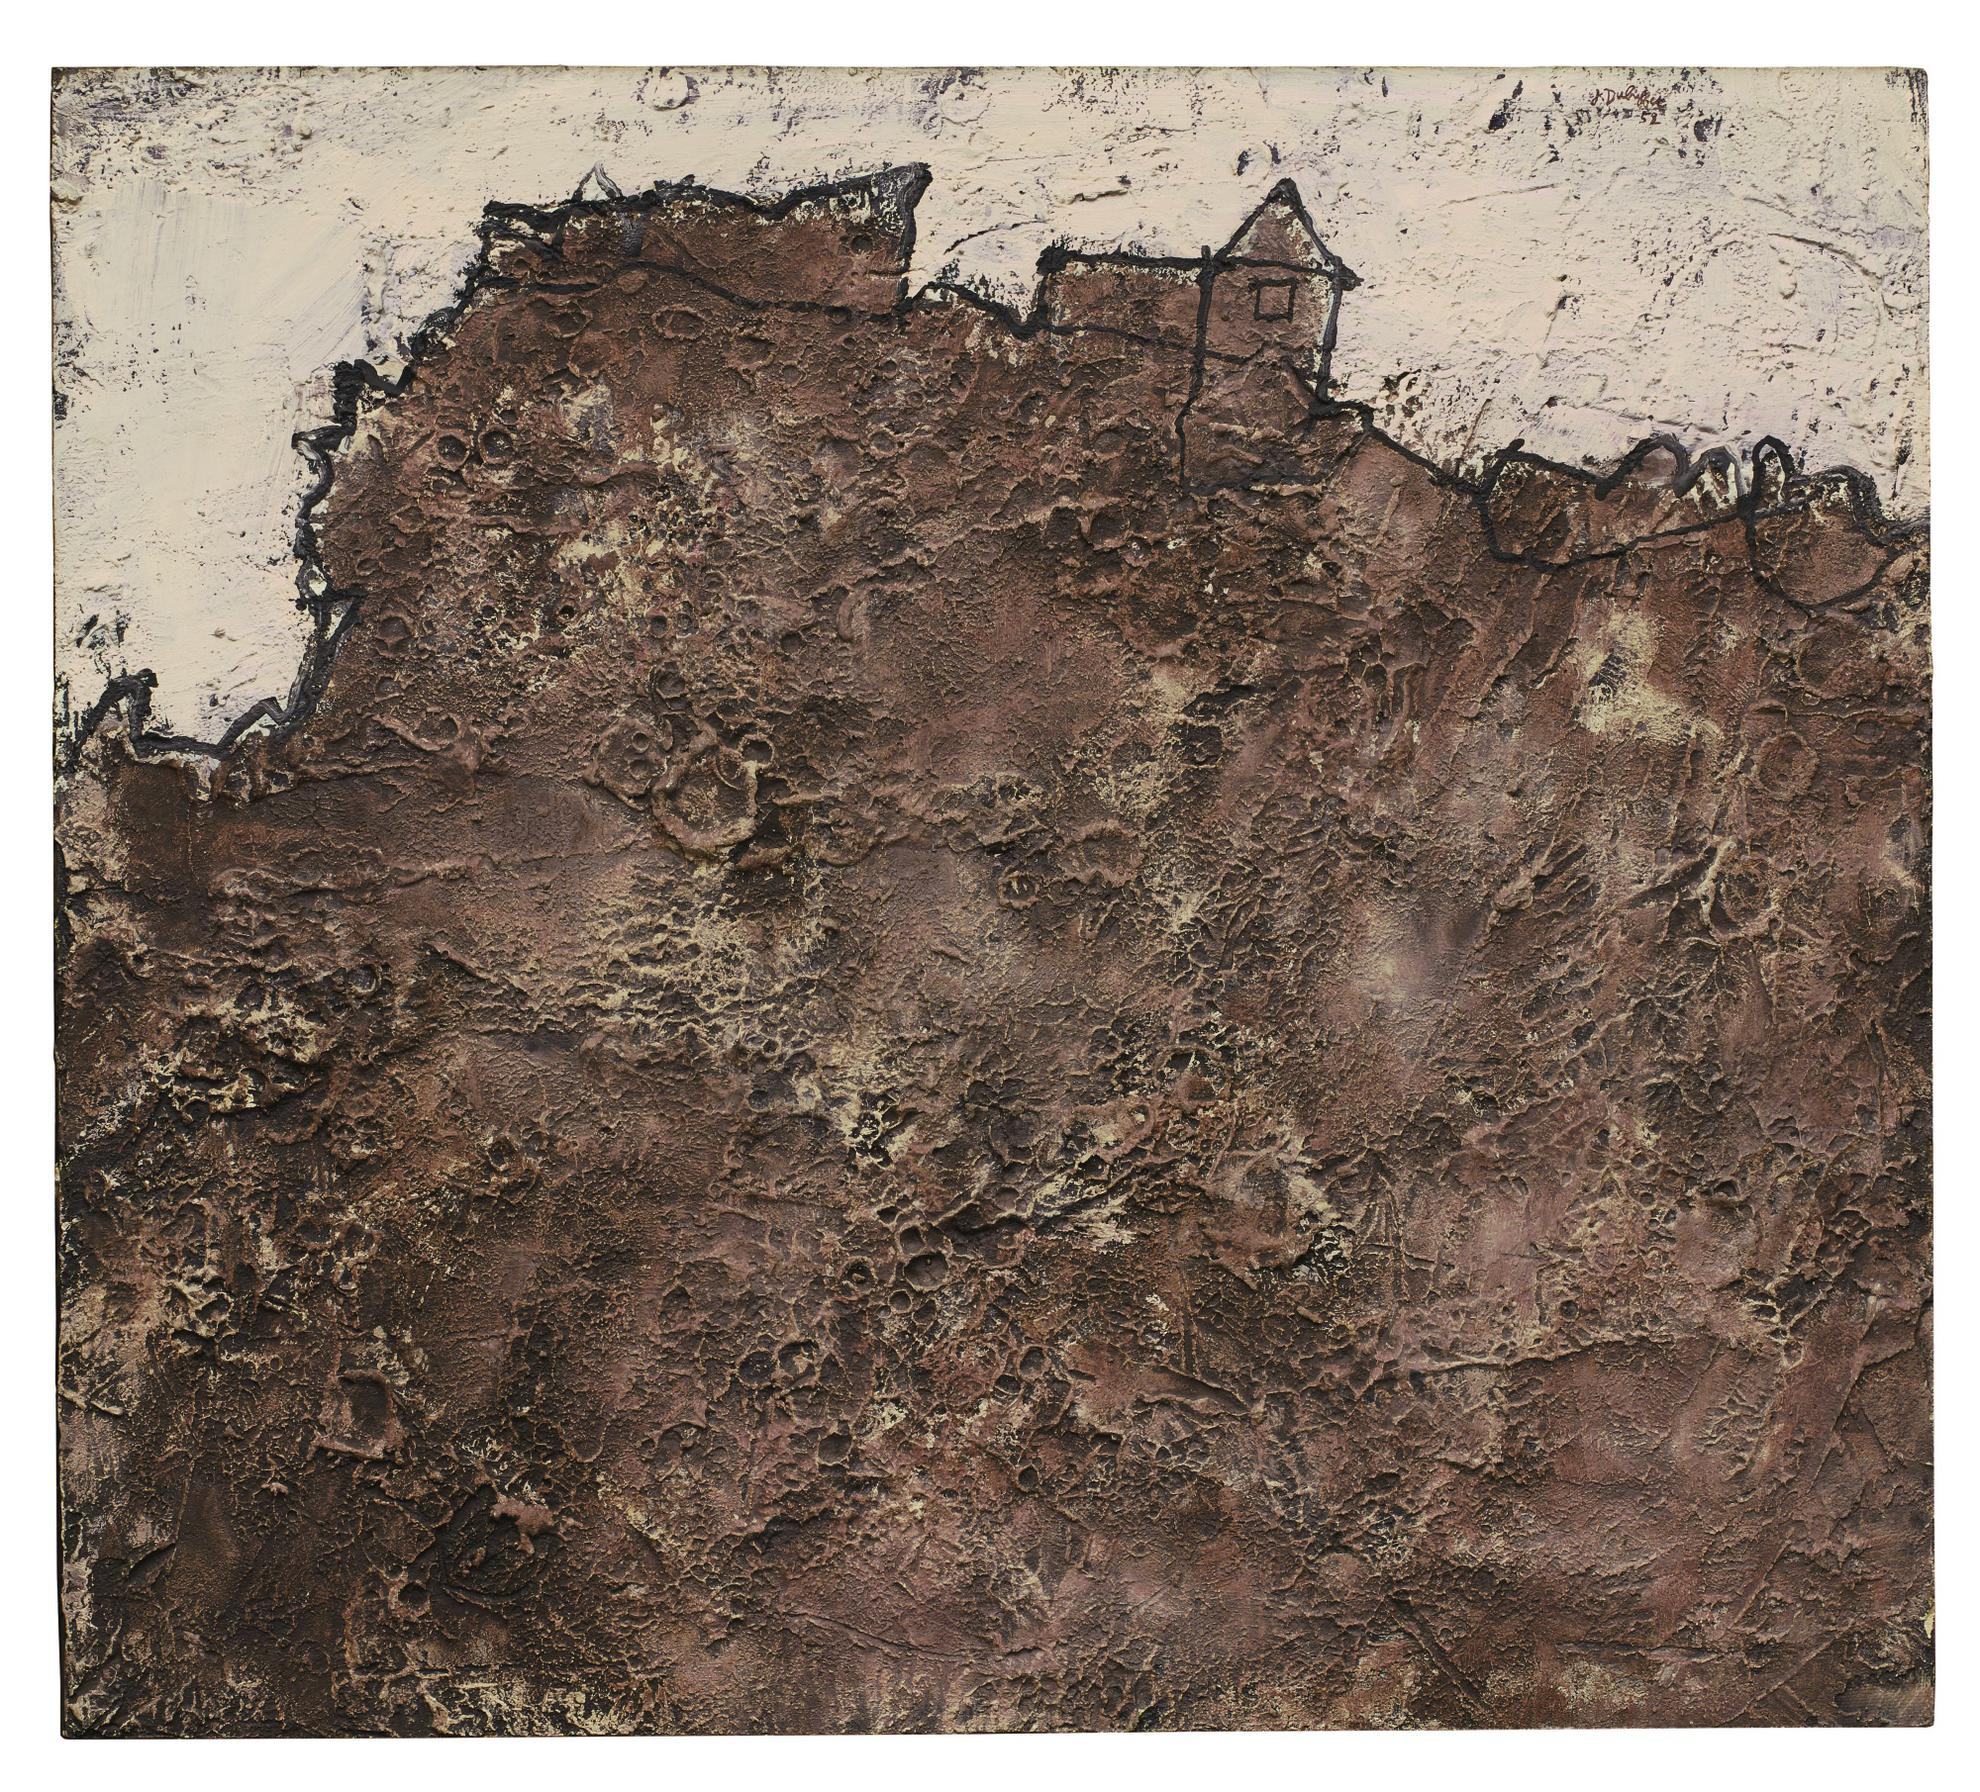 Jean Dubuffet-La Maison Abandonnee-1952